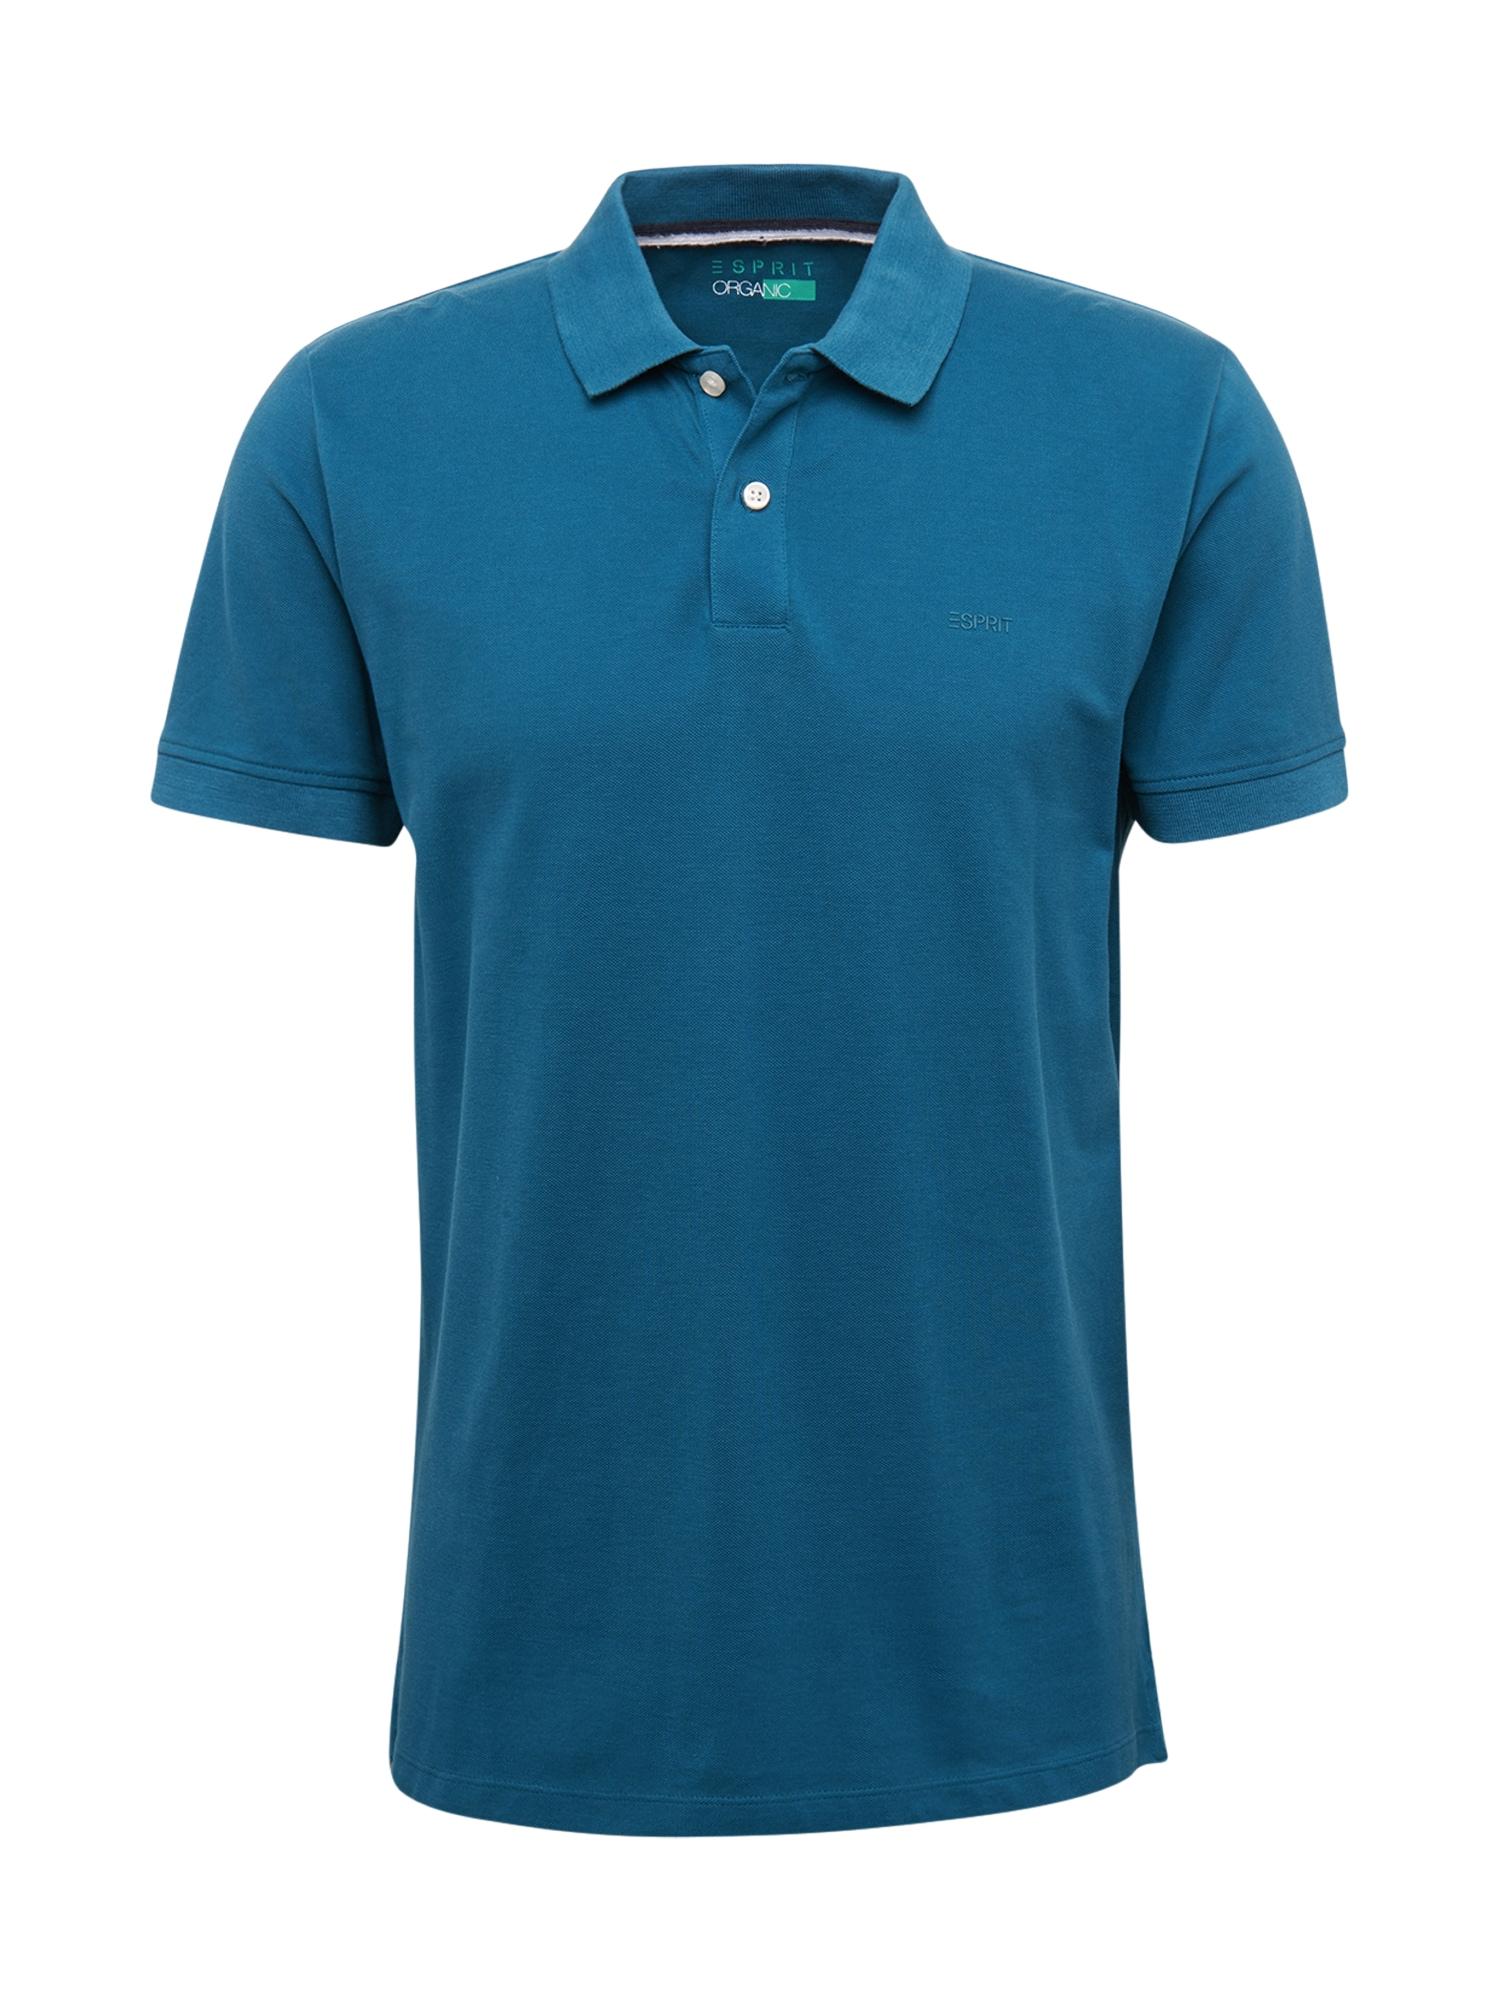 ESPRIT Marškinėliai 'OCS N pi po ss' benzino spalva